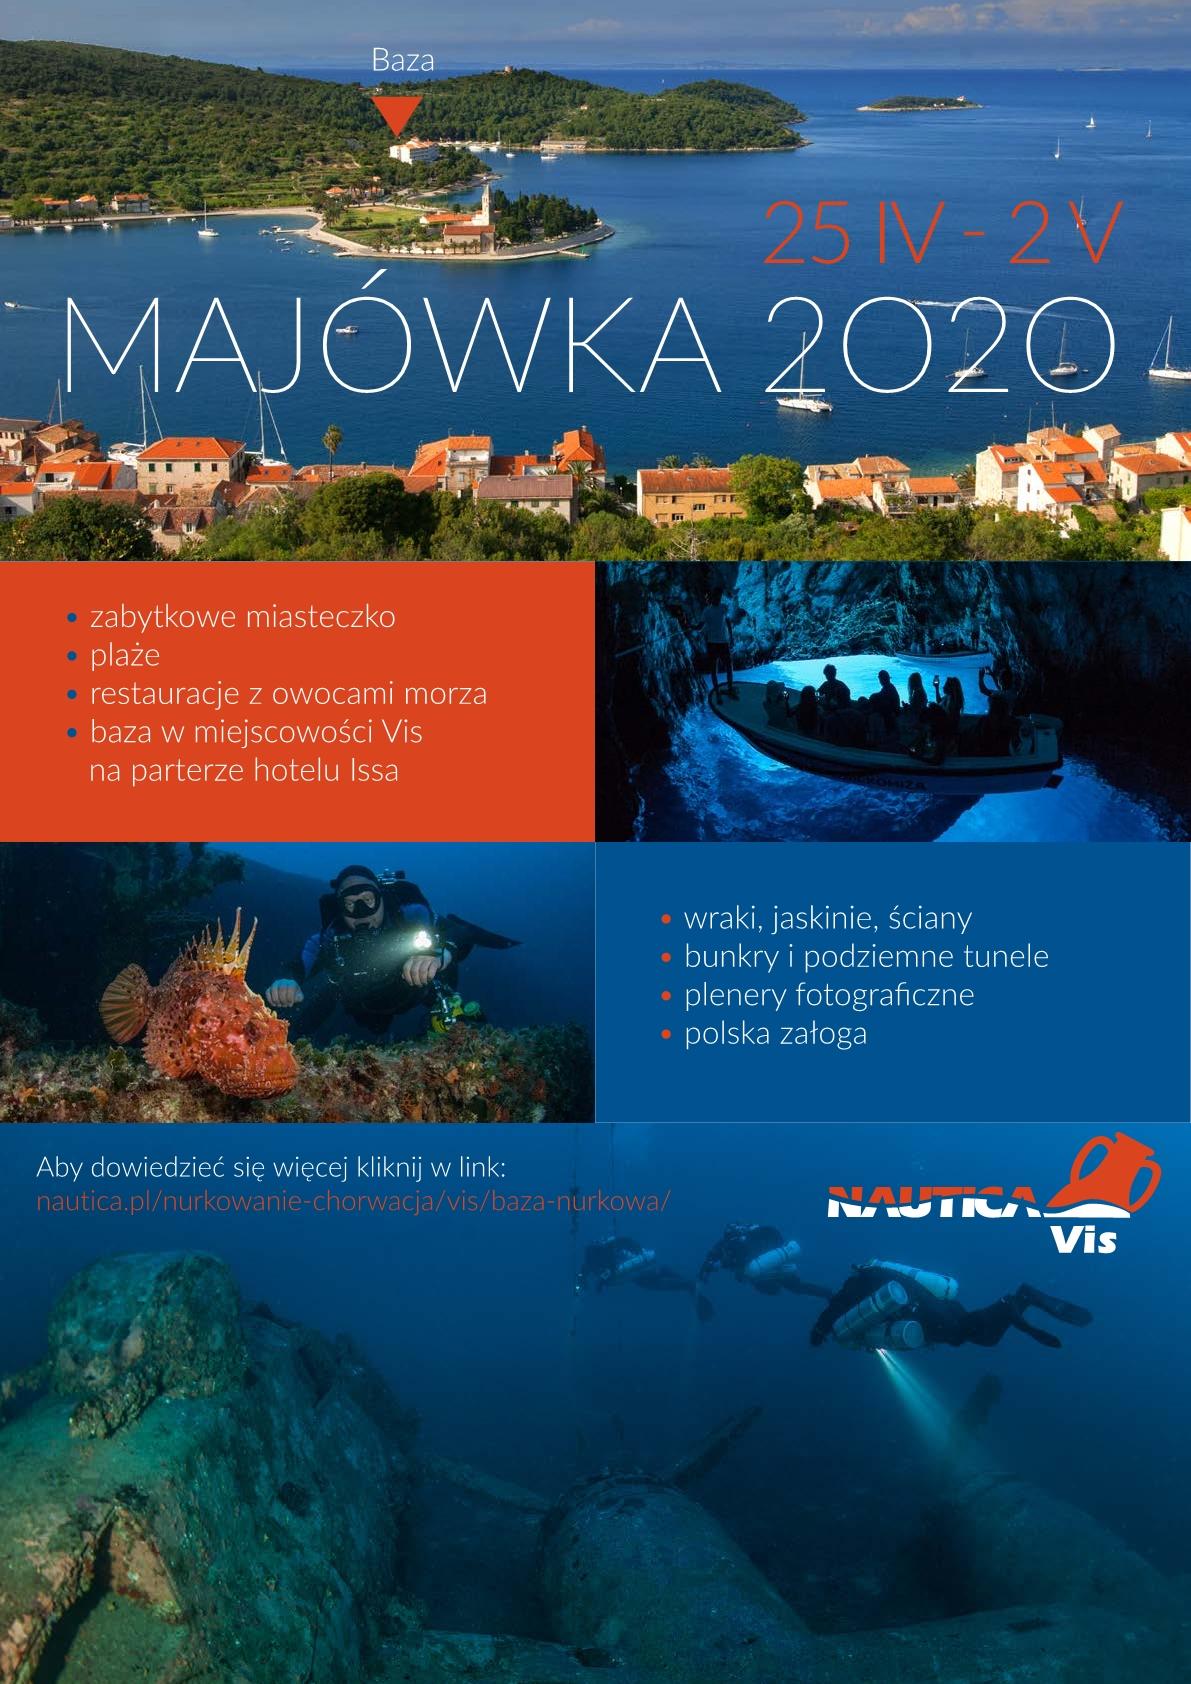 Majówka 2020 - Chorwacja / Vis -